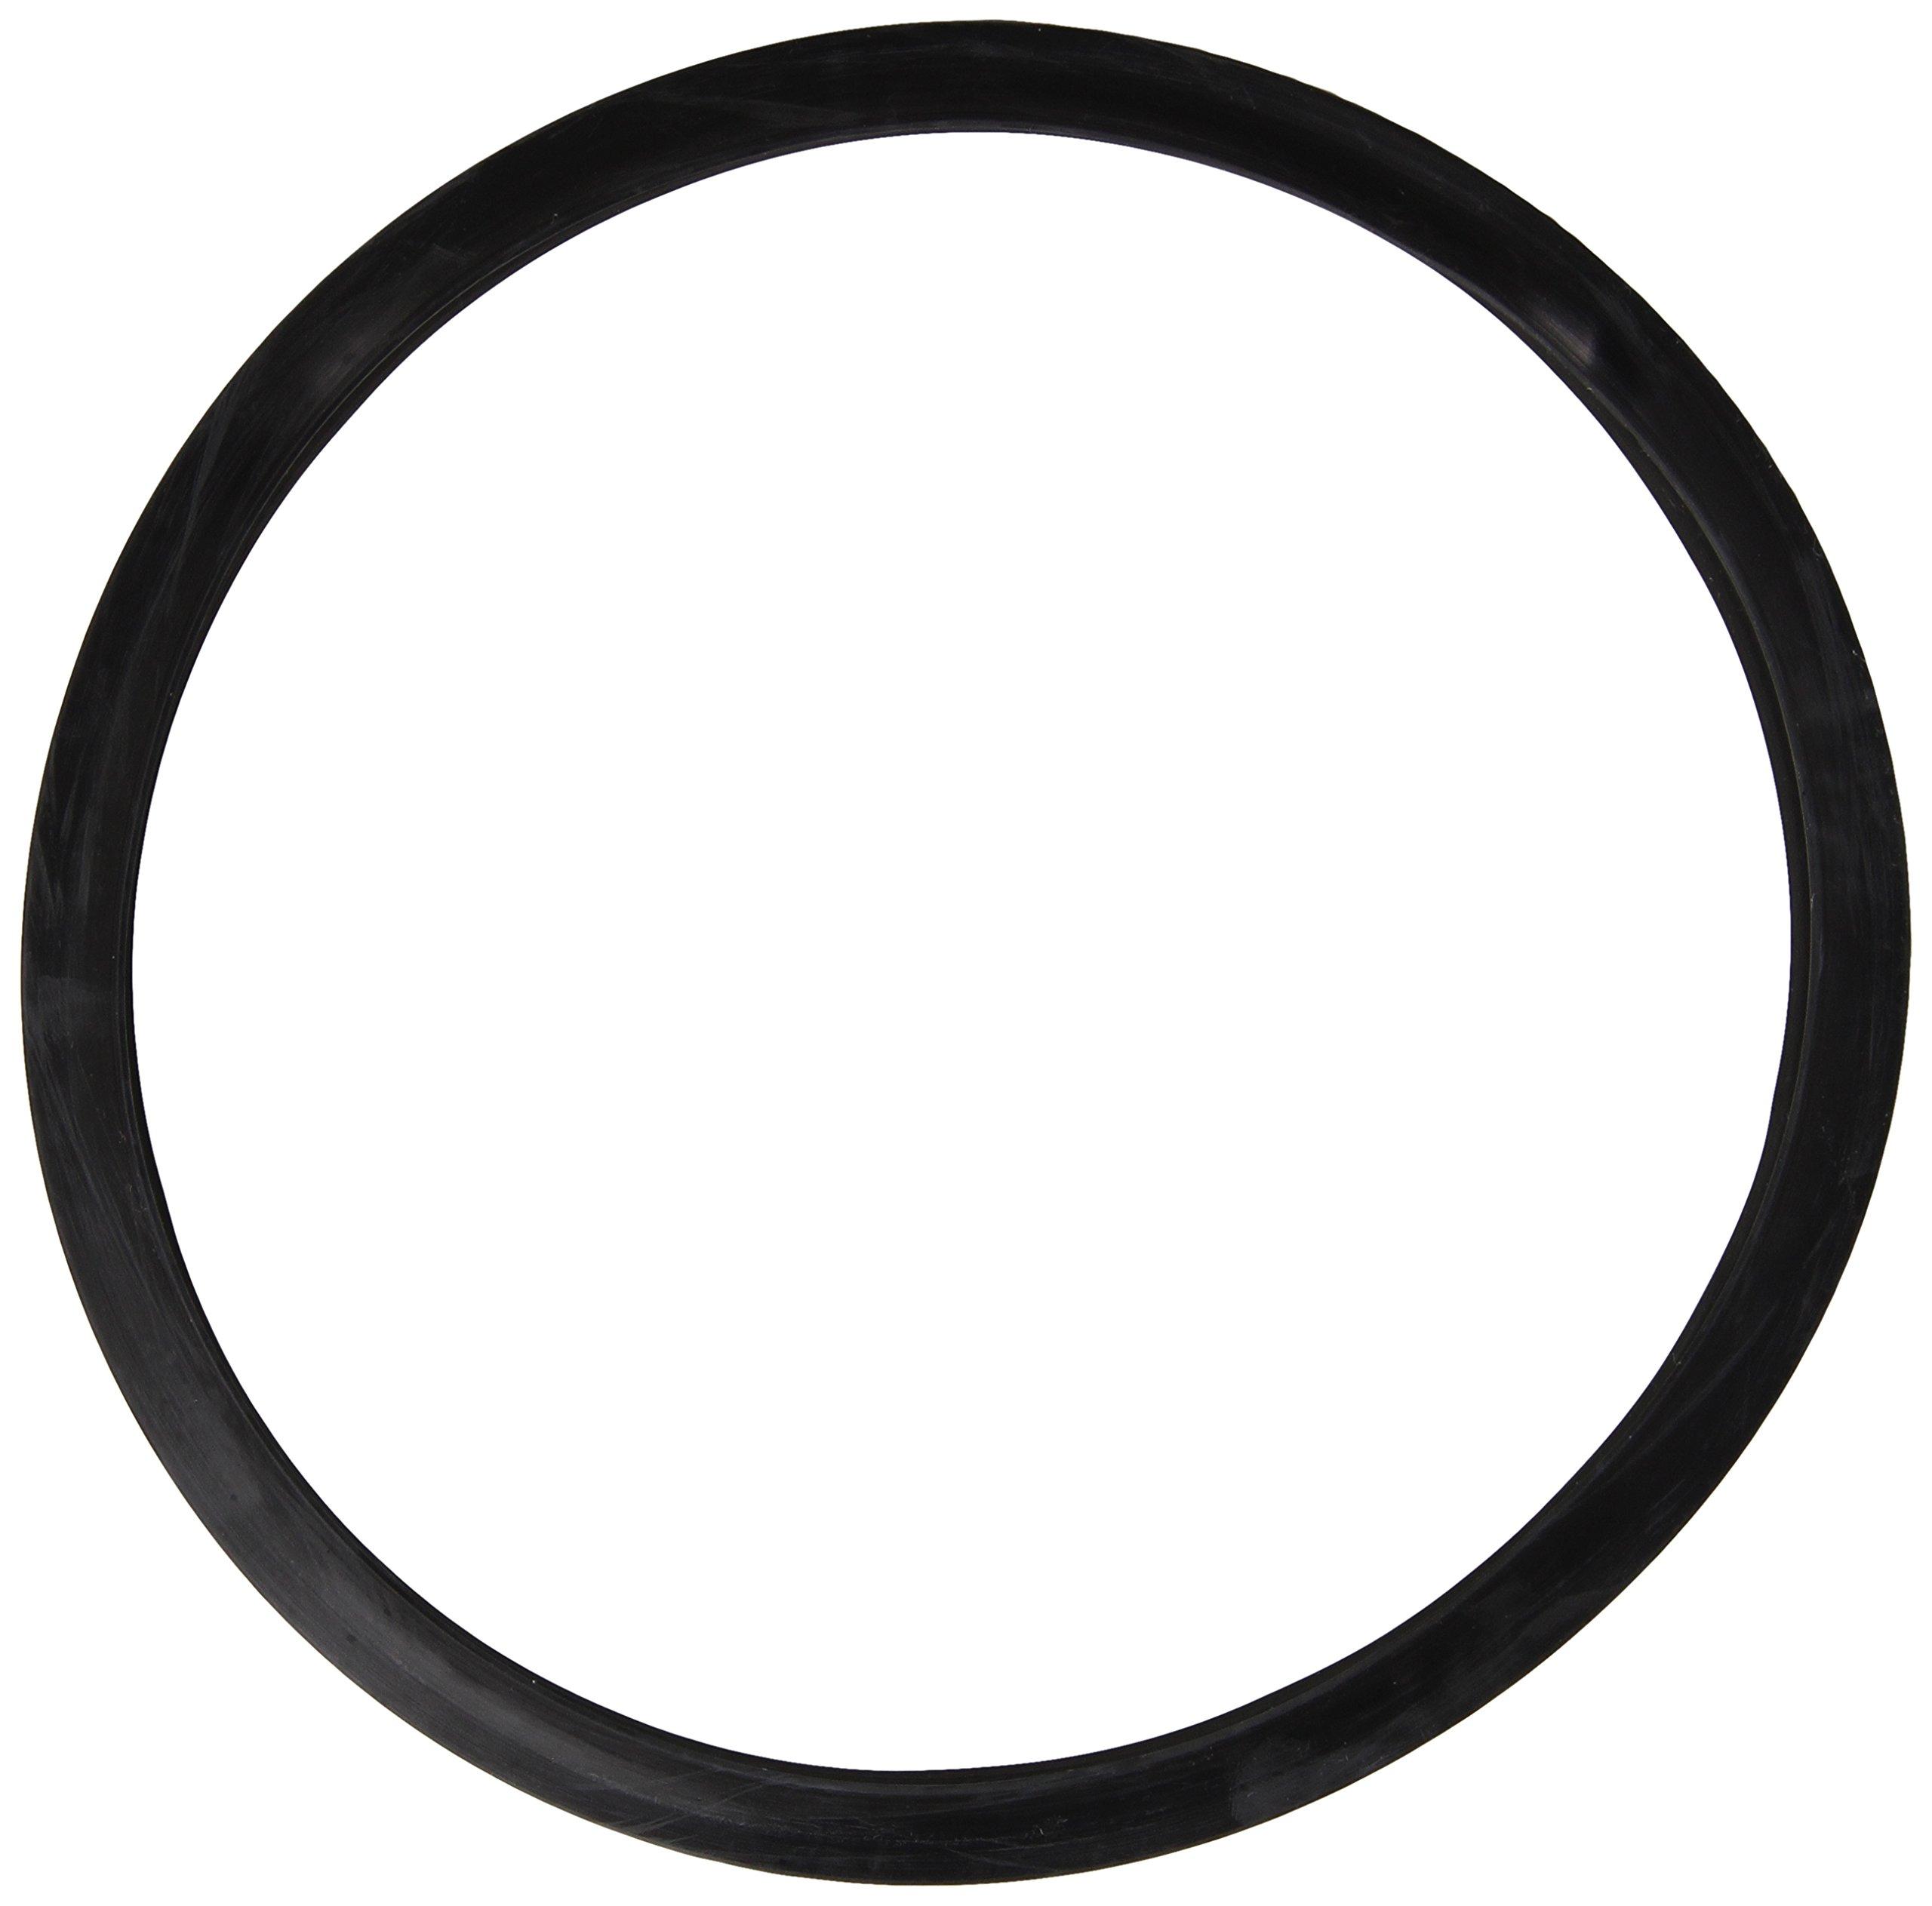 "Prestige Junior Sealing Ring Gasket for Deluxe Plus & Alpha Deluxe Stainless Steel 3/4/5.5-Liter Pressure Cookers, 8.5"""